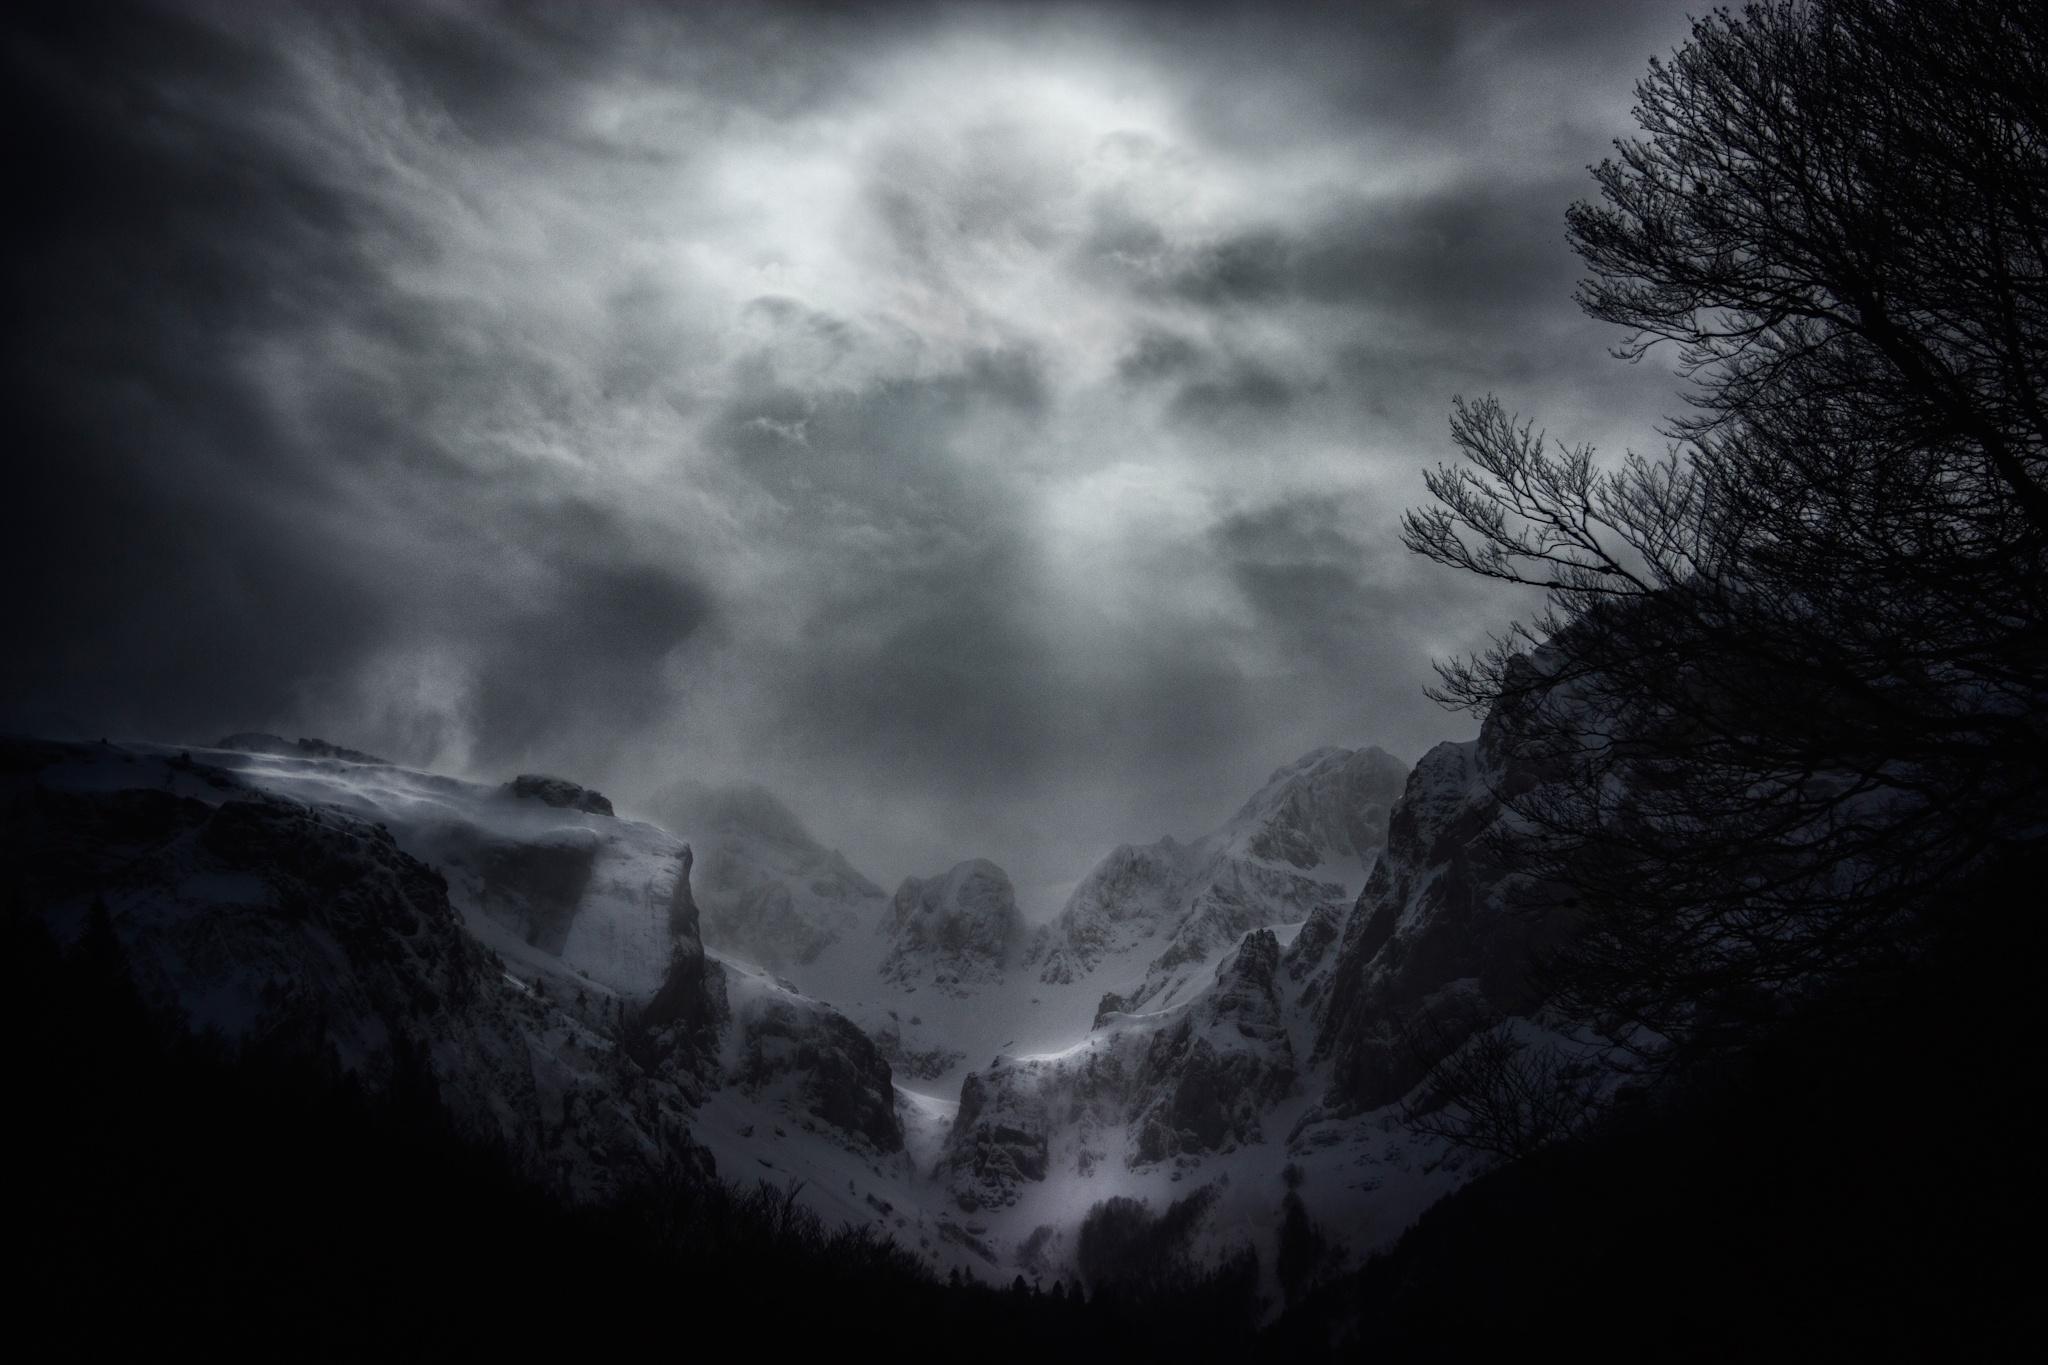 La Chorrota del Aspe - Paisajes del valle - Fotos del Valle del Aragón, Mikel Besga